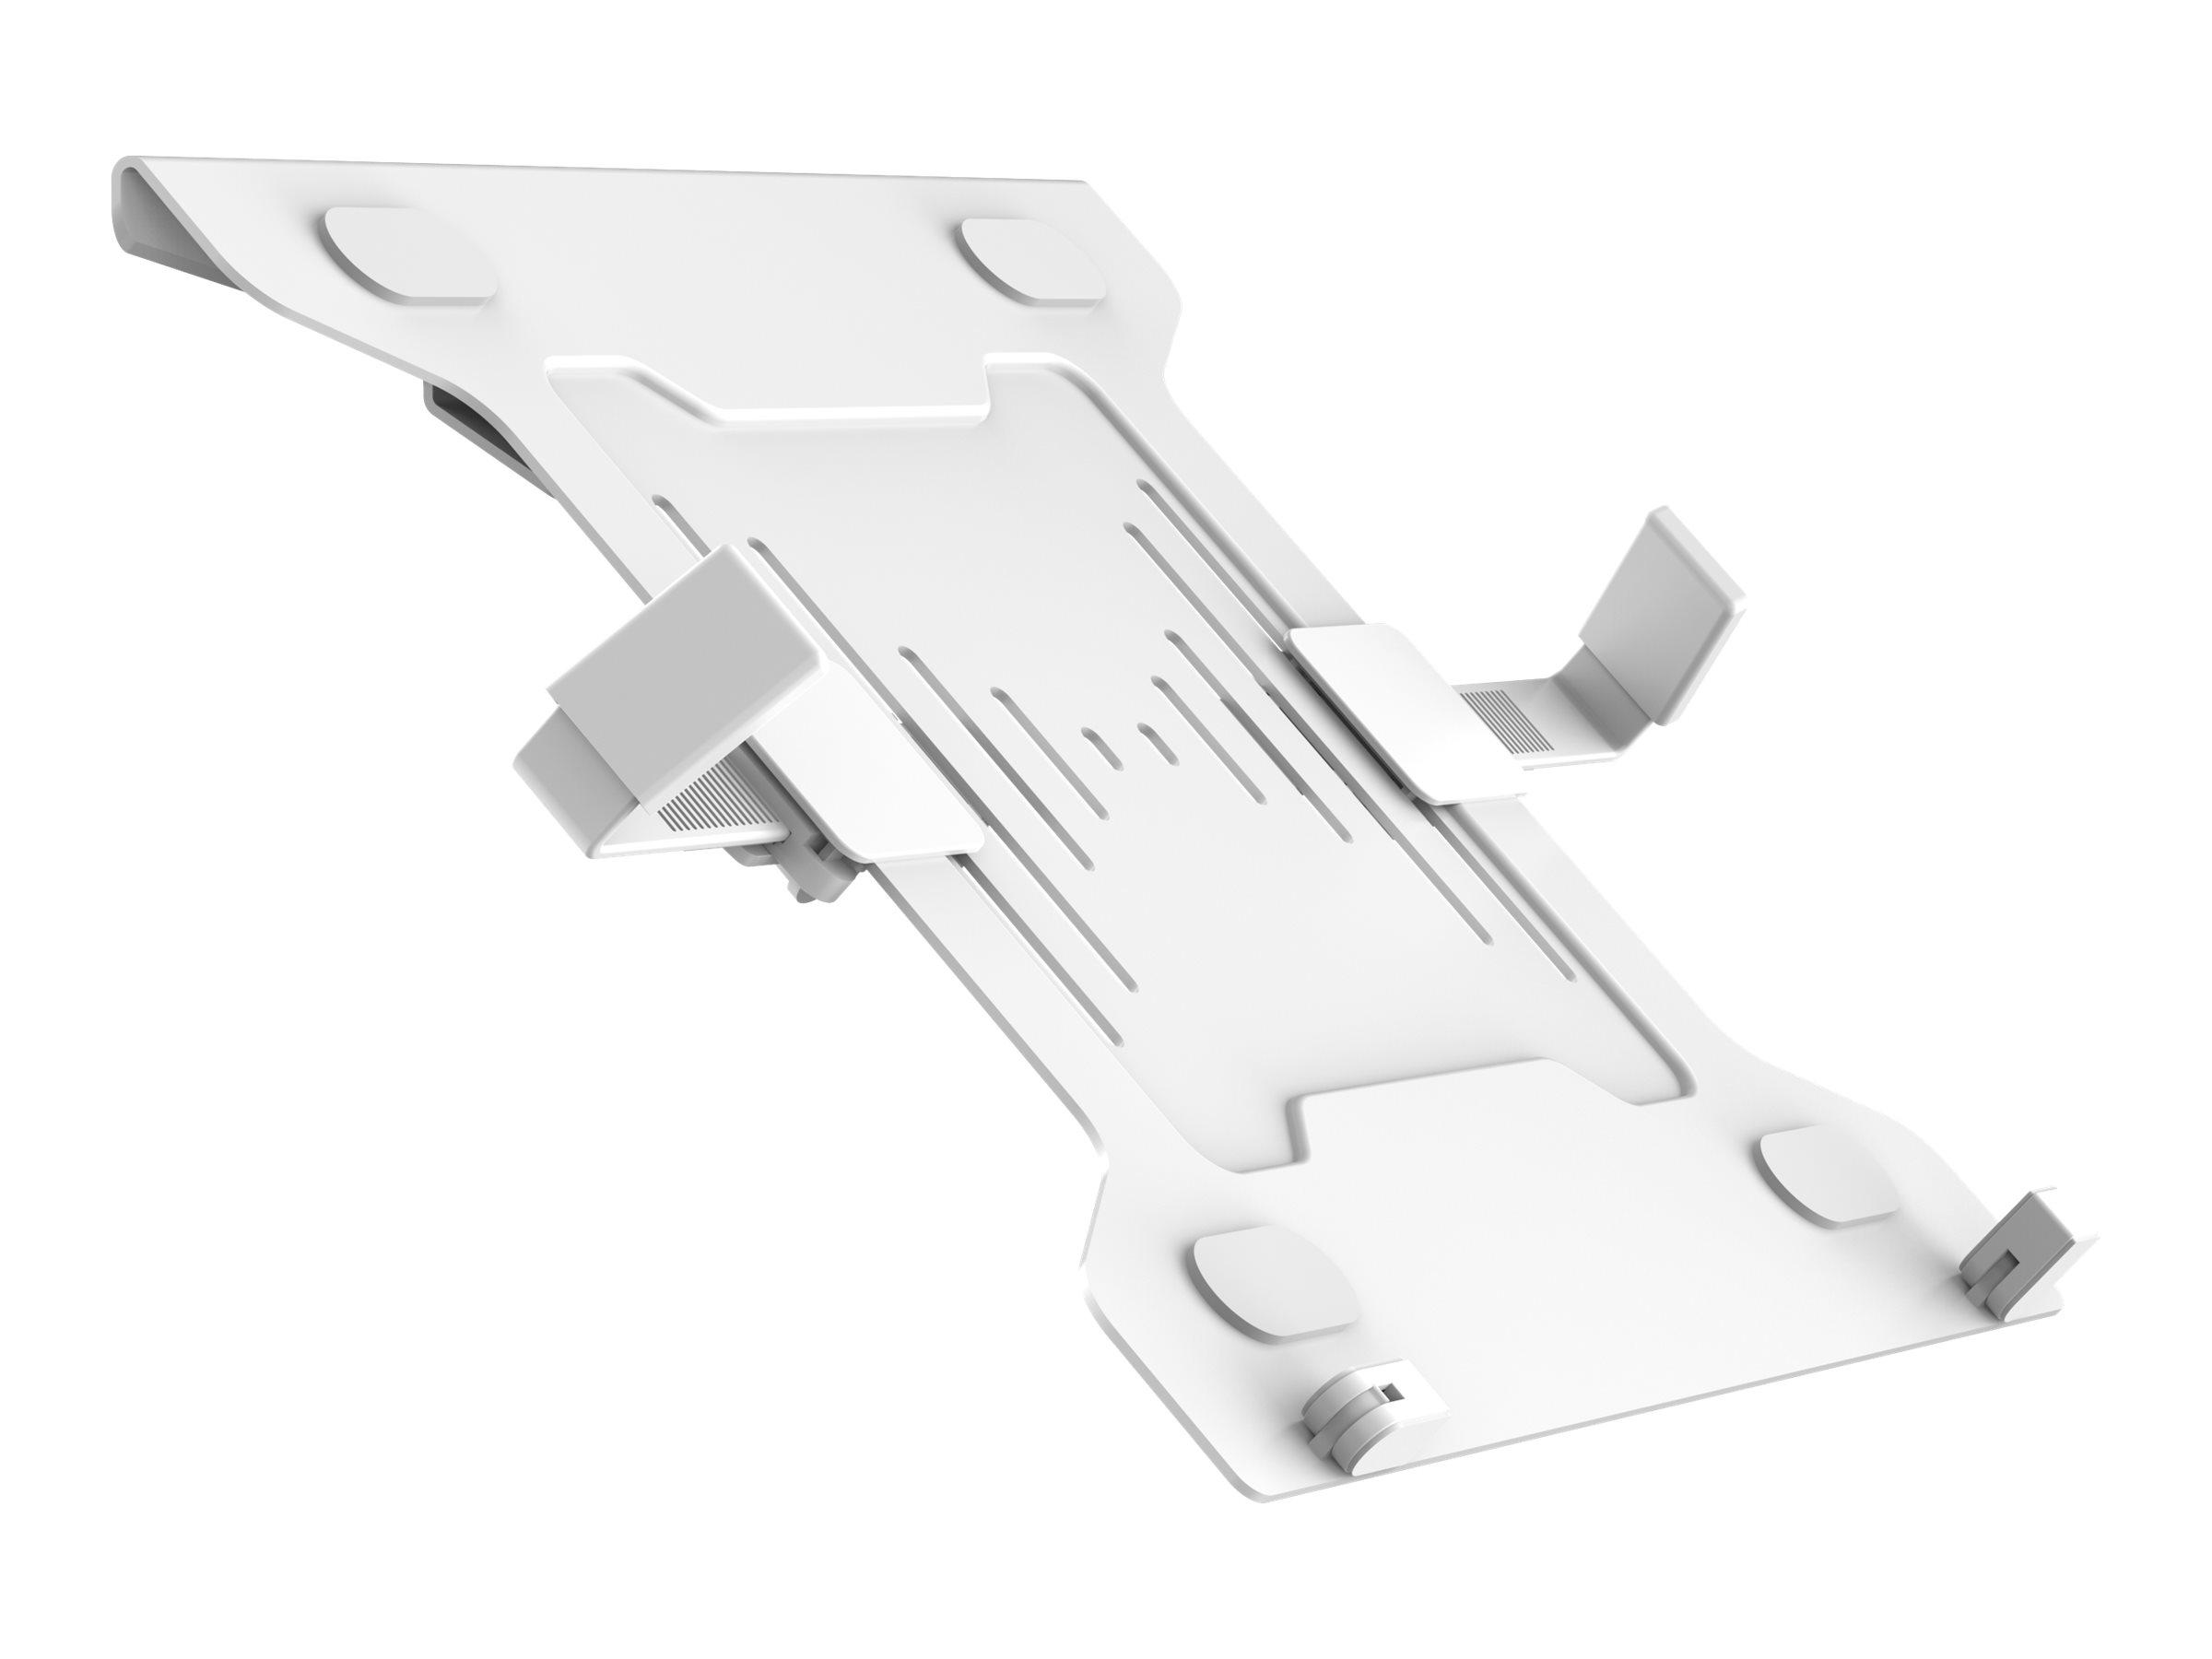 Vision VFM-DP2SHELFW - Montagekomponente (Regal) für Notebook / Tablet